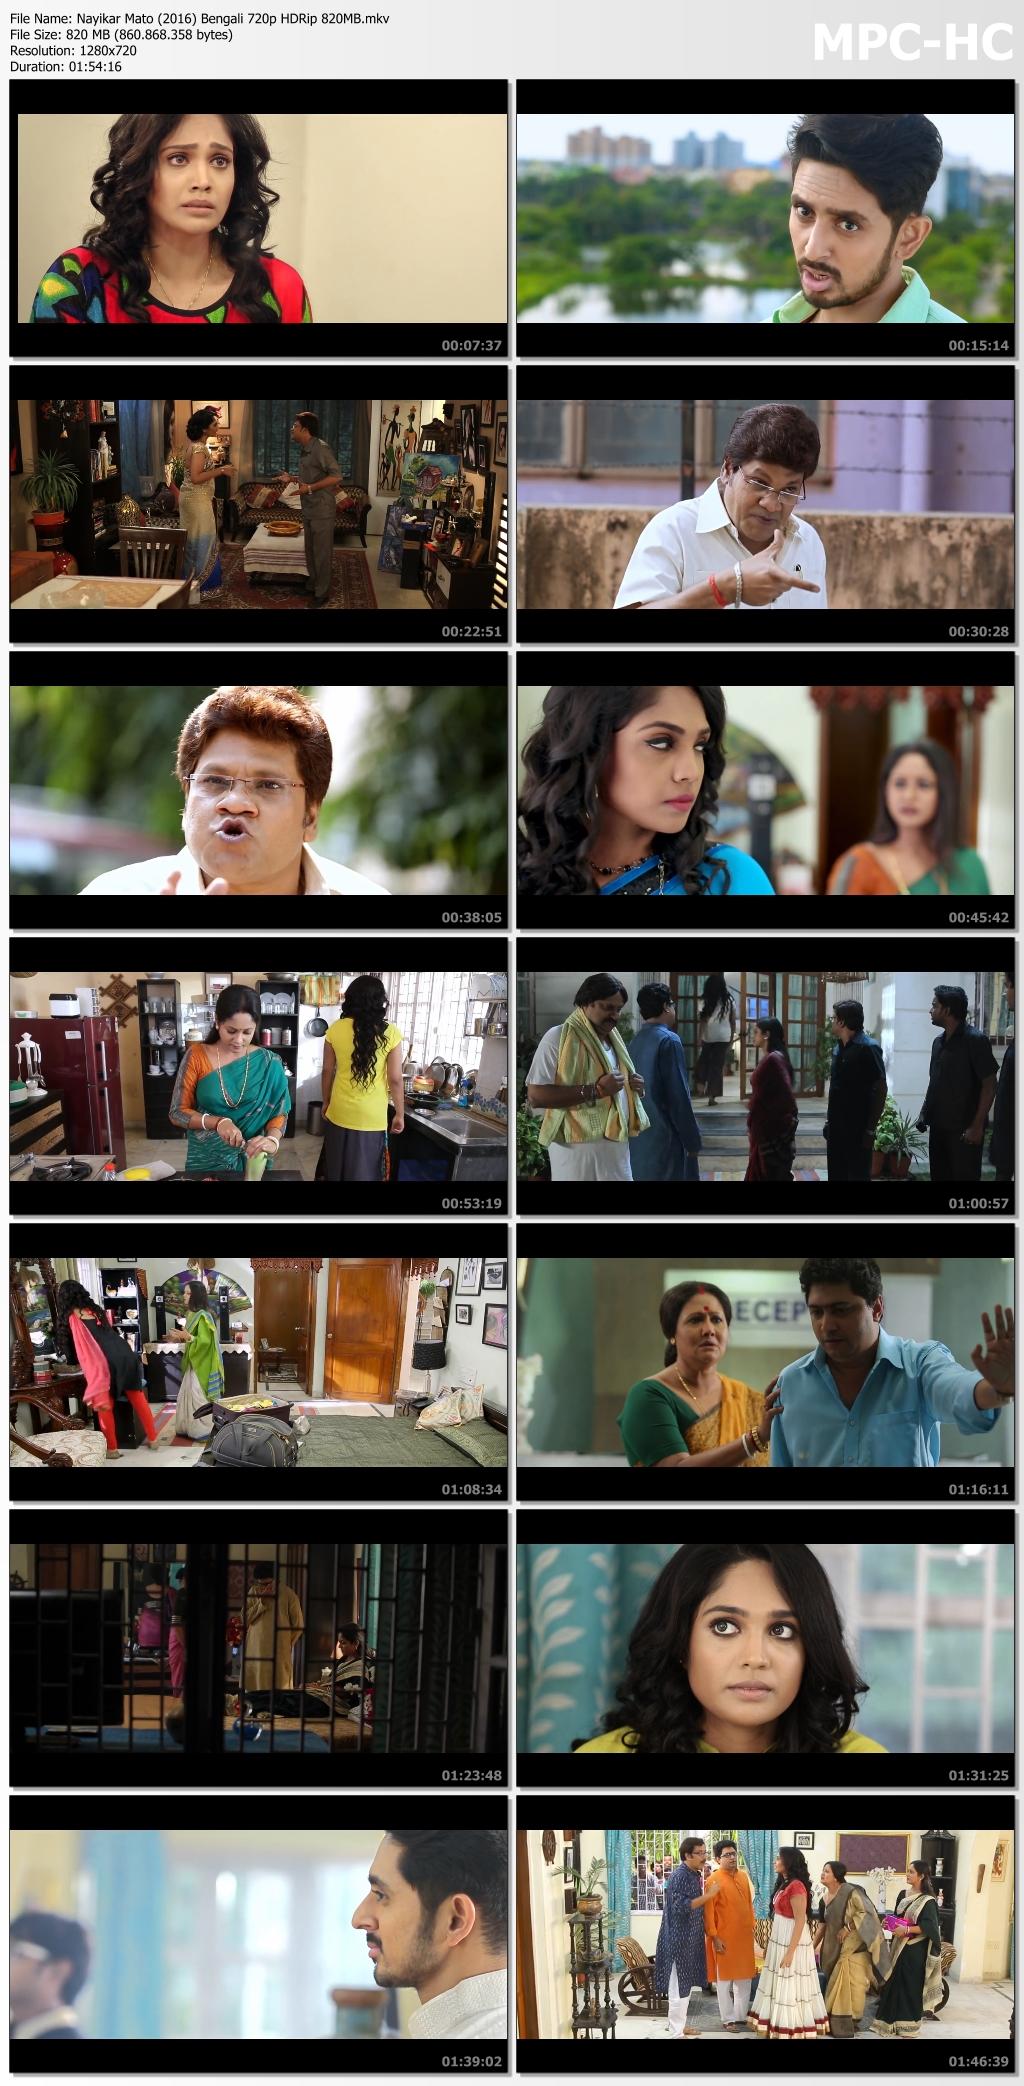 Nayikar-Mato-2016-Bengali-720p-HDRip-820-MB-mkv-thumbs